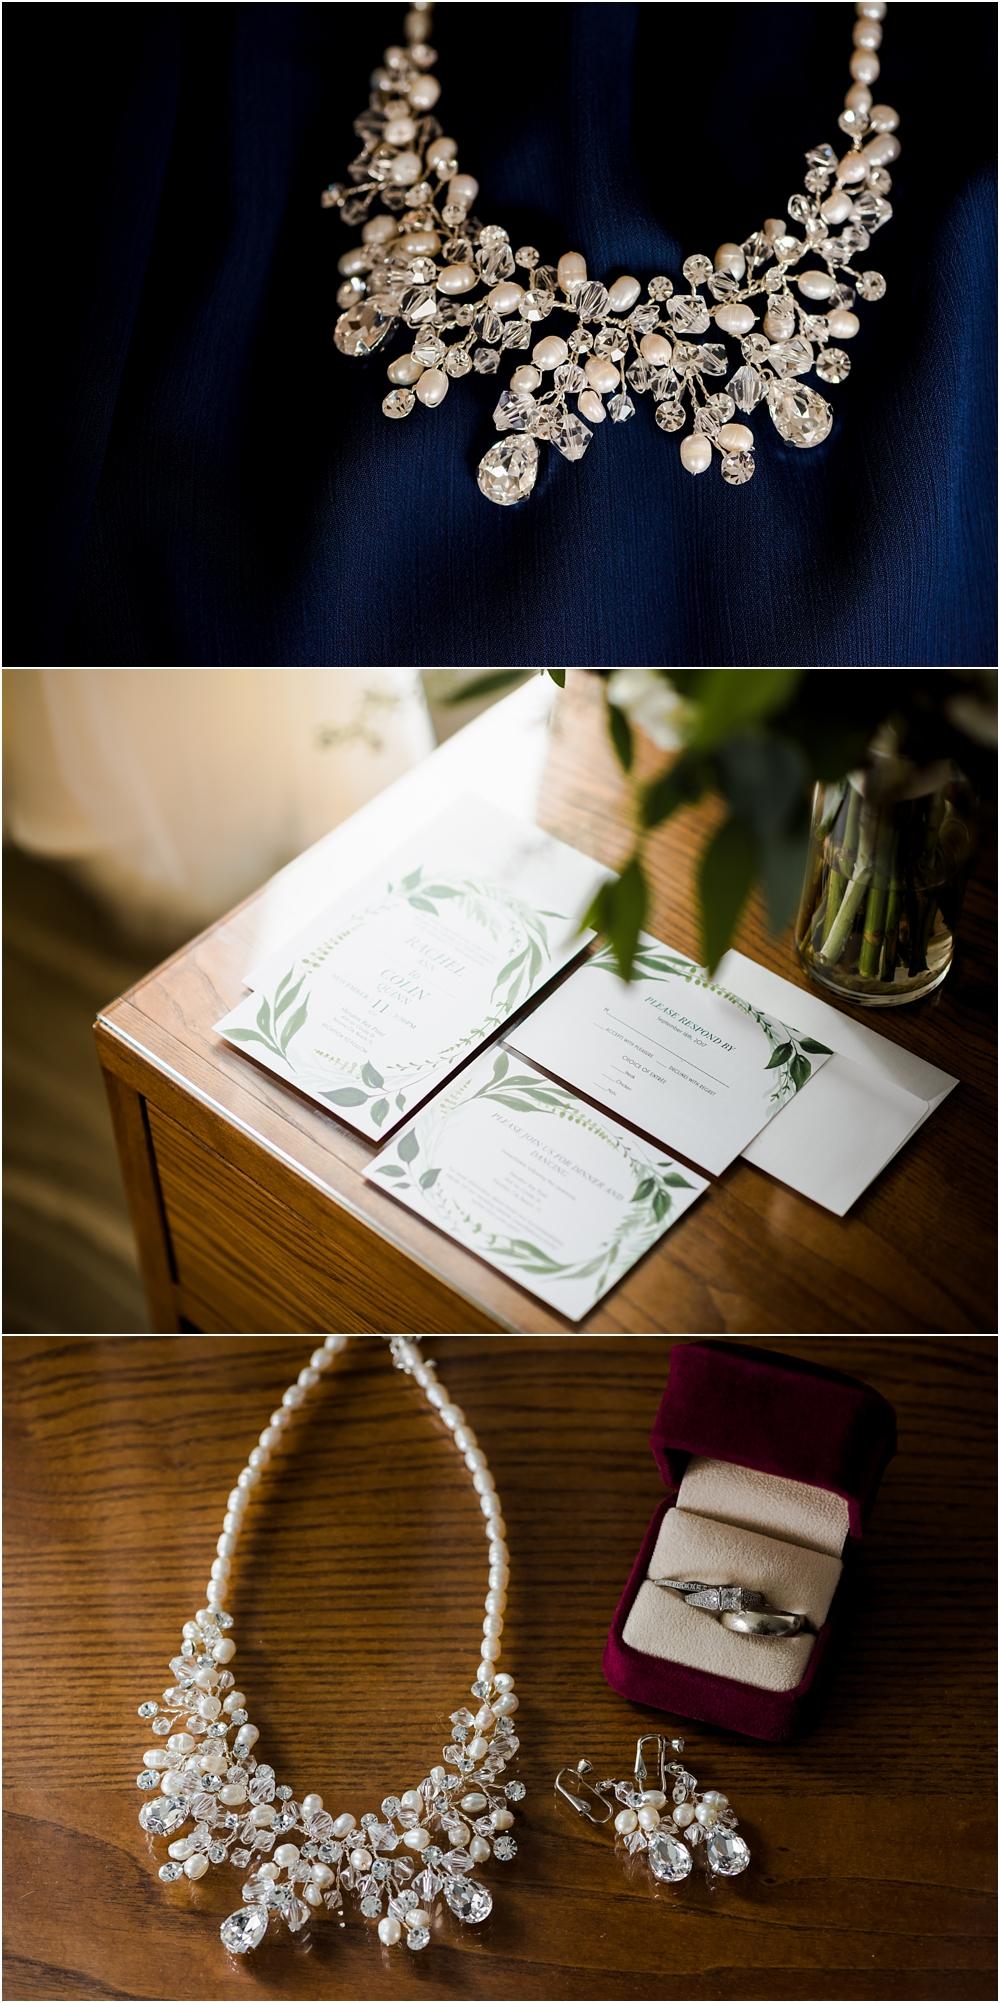 quinn-bay-point-sheraton-florida-wedding-photographer-kiersten-grant-4.jpg